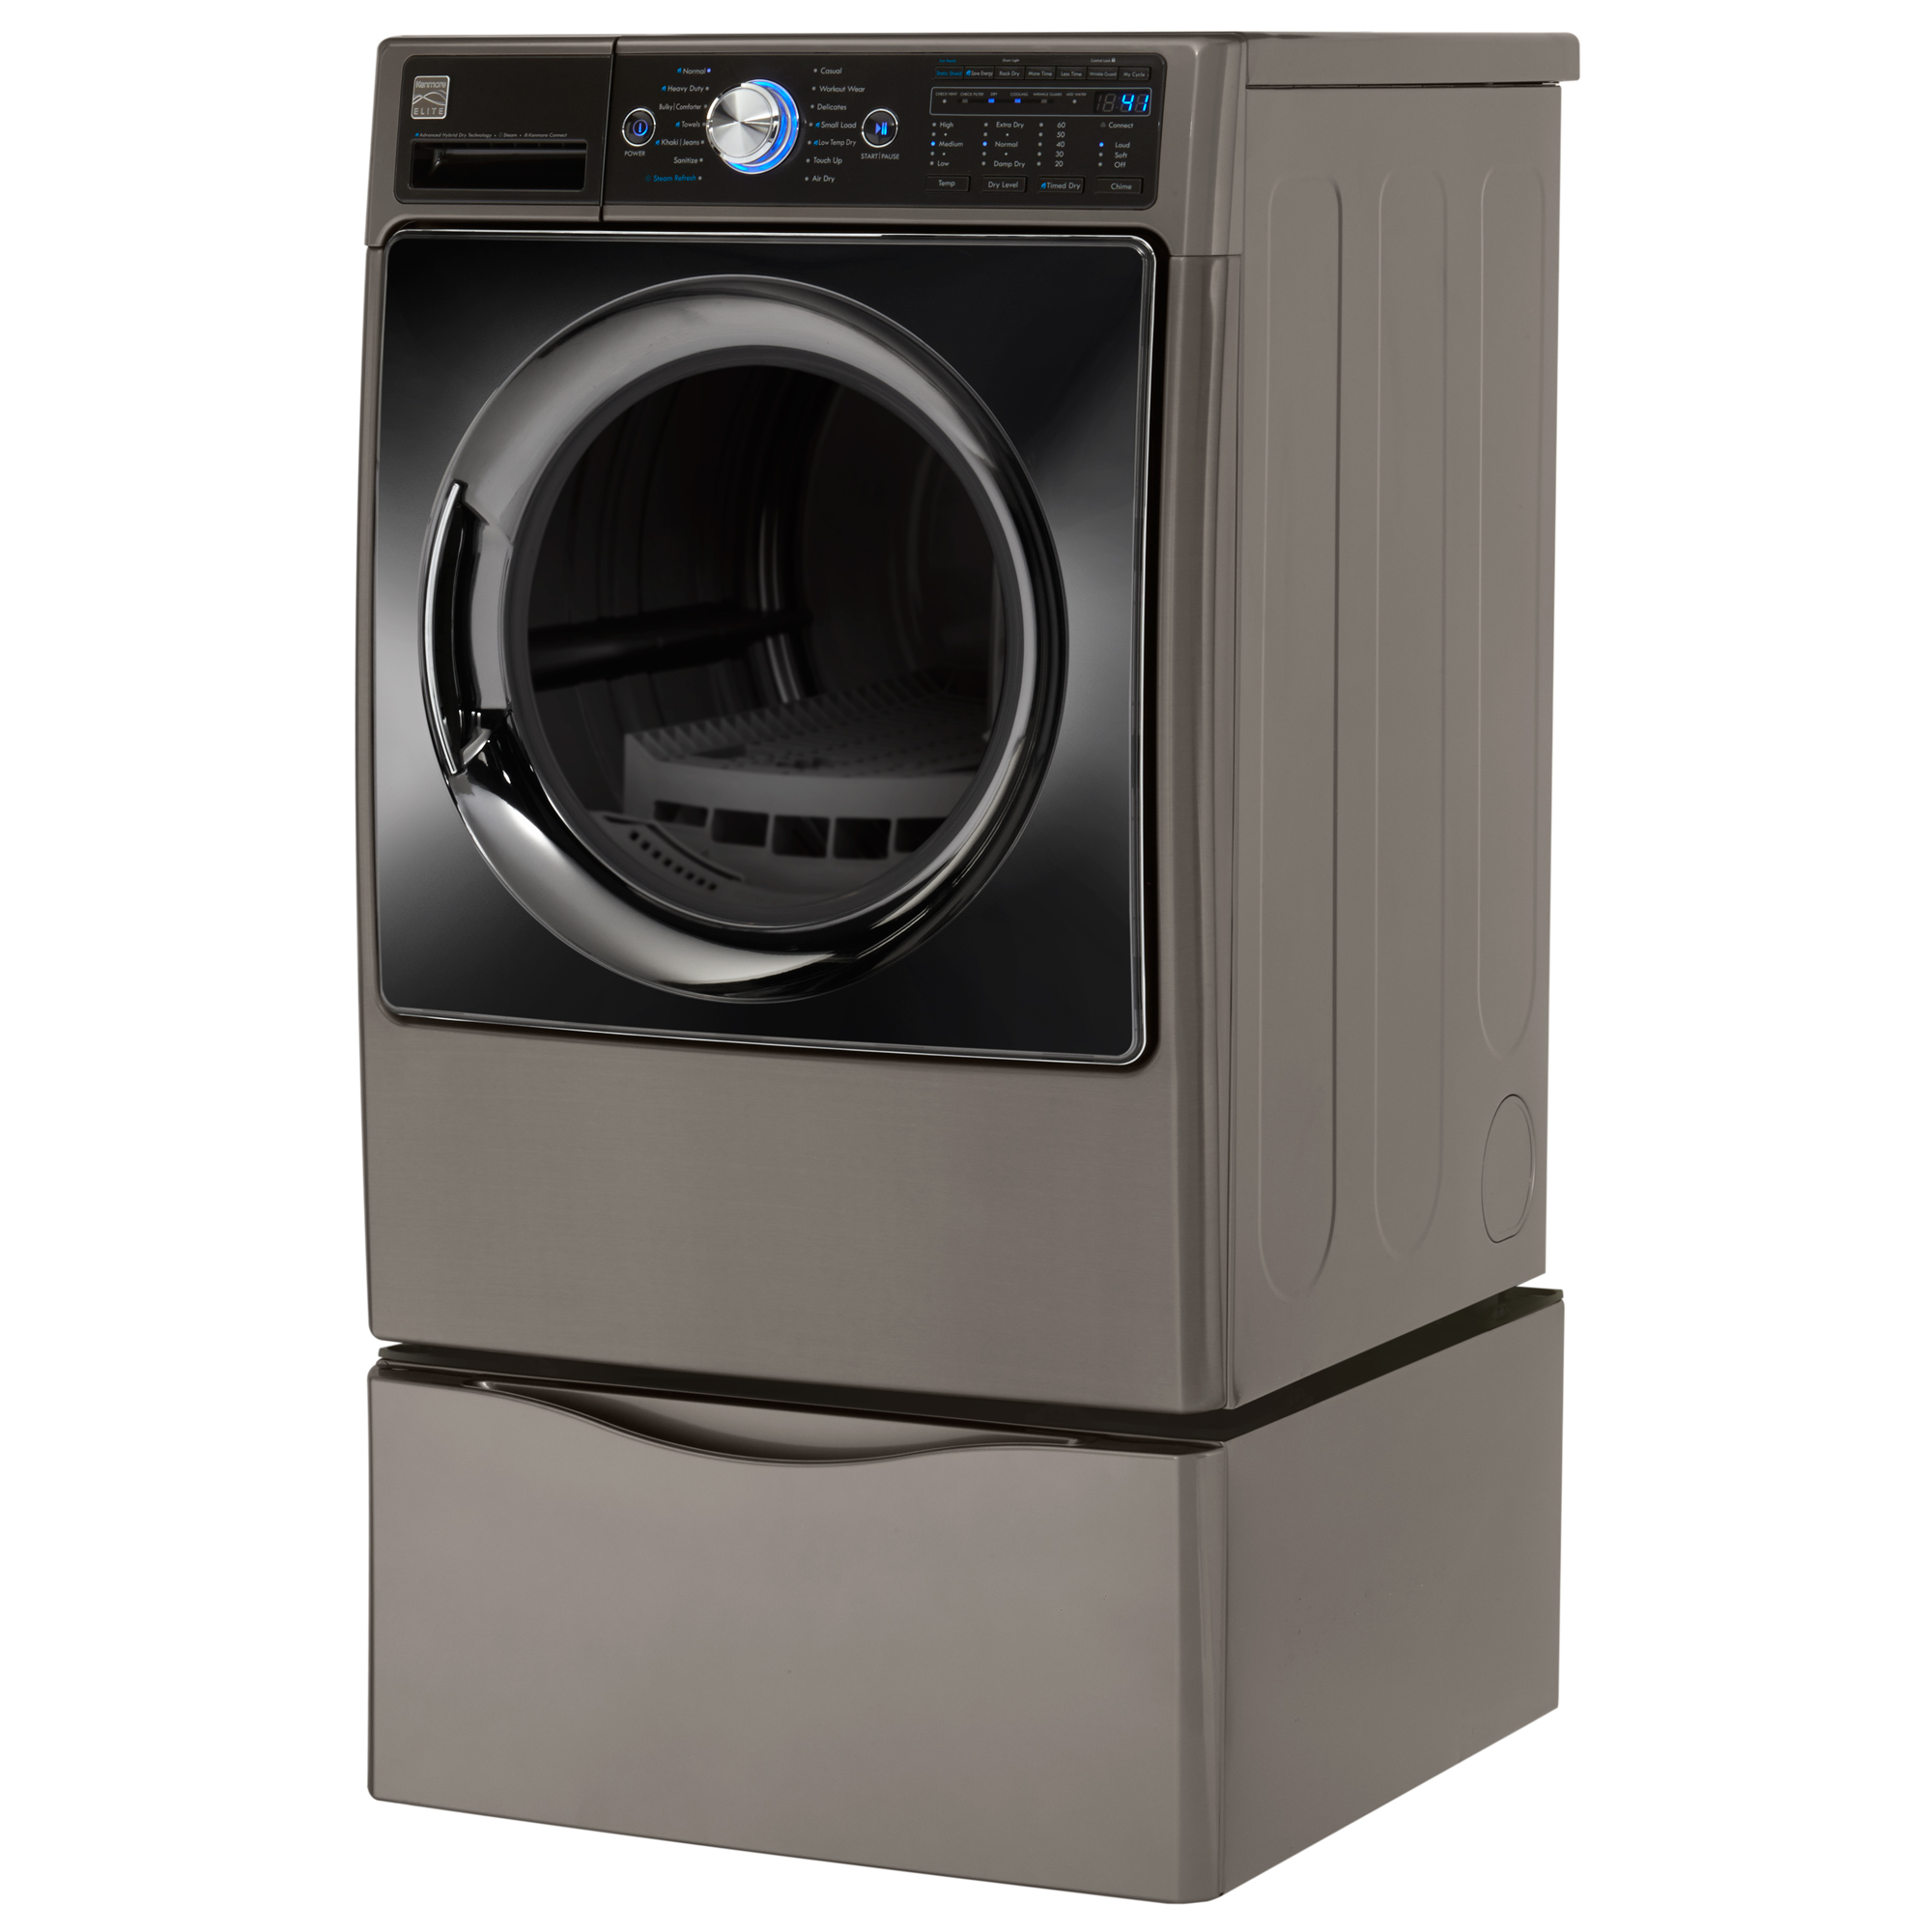 Kenmore Elite 81593 7.3 cu. ft. Advanced Hybrid Dry Technology (Heat Pump) Electric Dryer w/ Steam – Metallic Silver